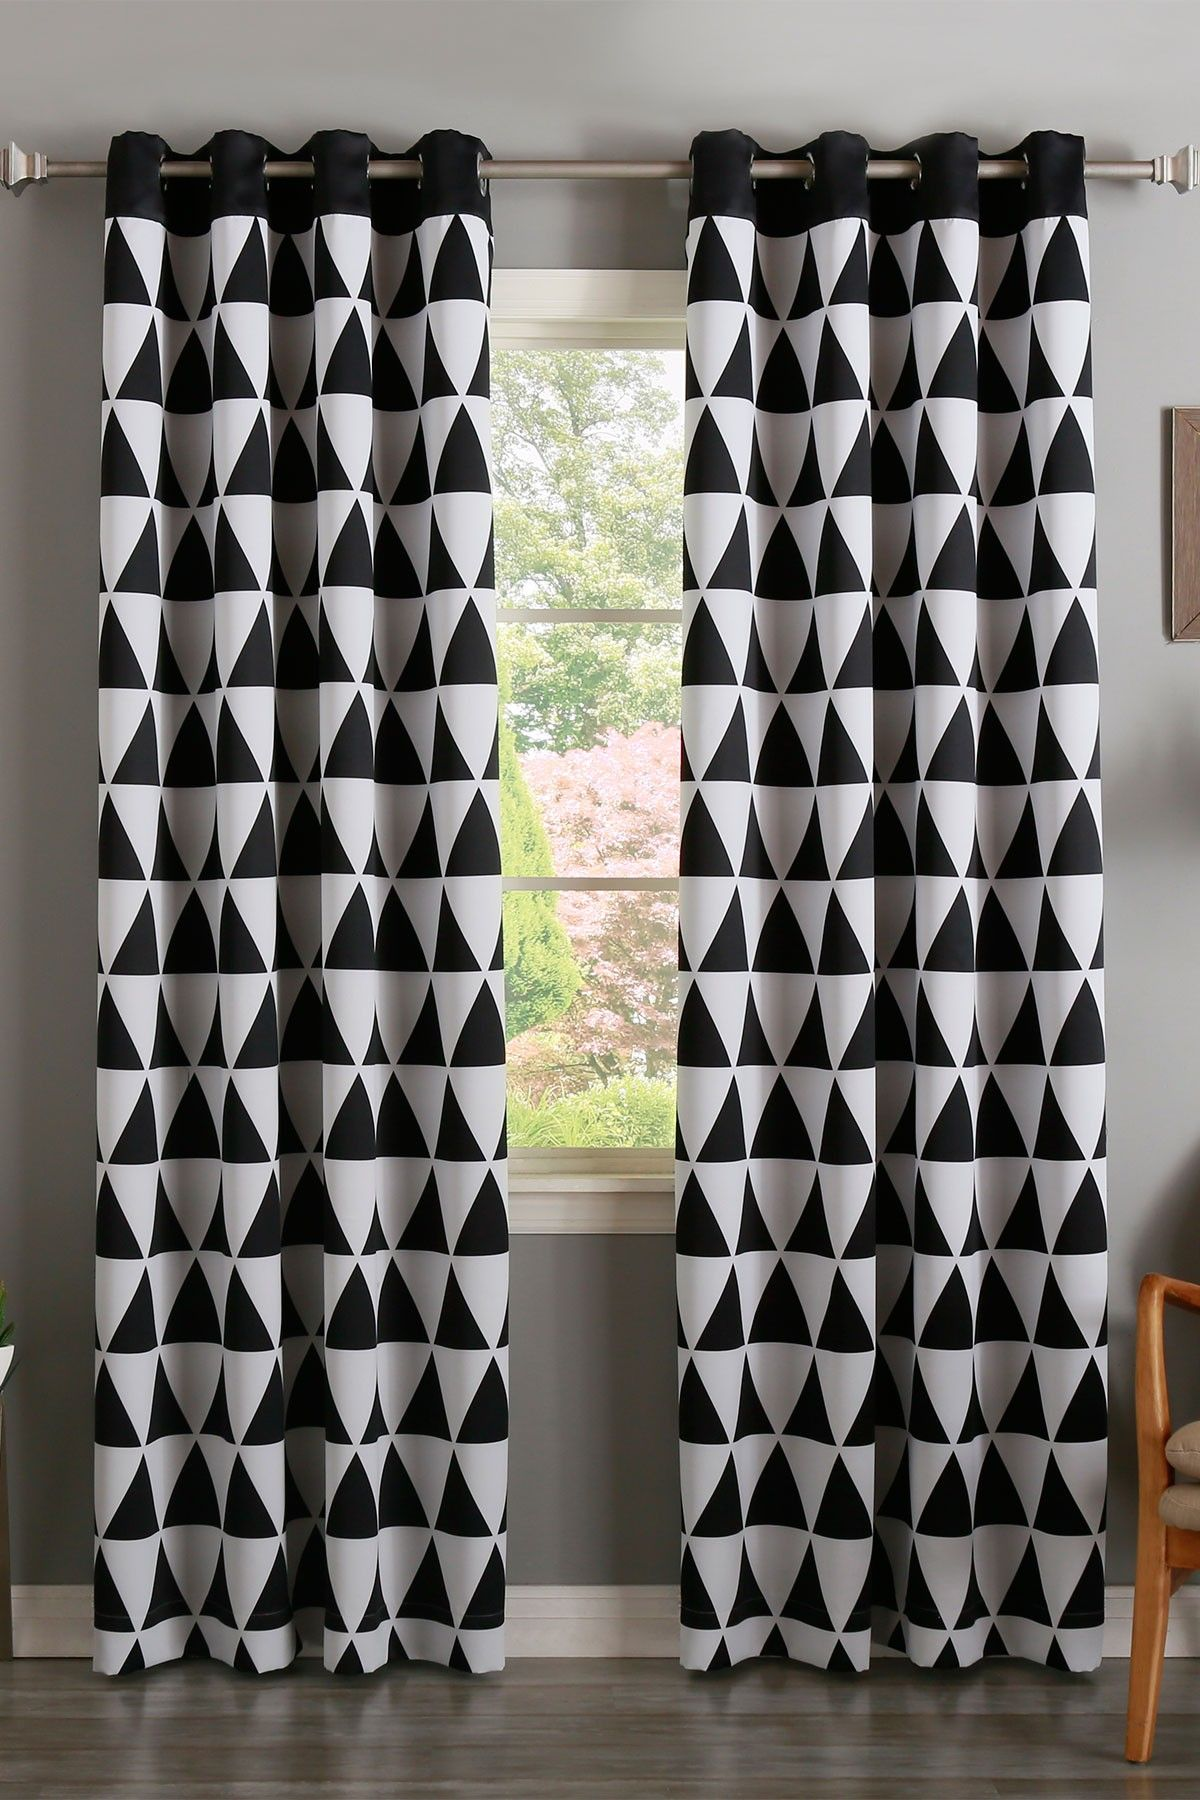 Best Home Fashion Inc Black Geometric Triangle Printed Room Darkening Grommet Curtains Set Of 2 Panels Hautelook Curtains Grommet Curtains Window Wall Decor